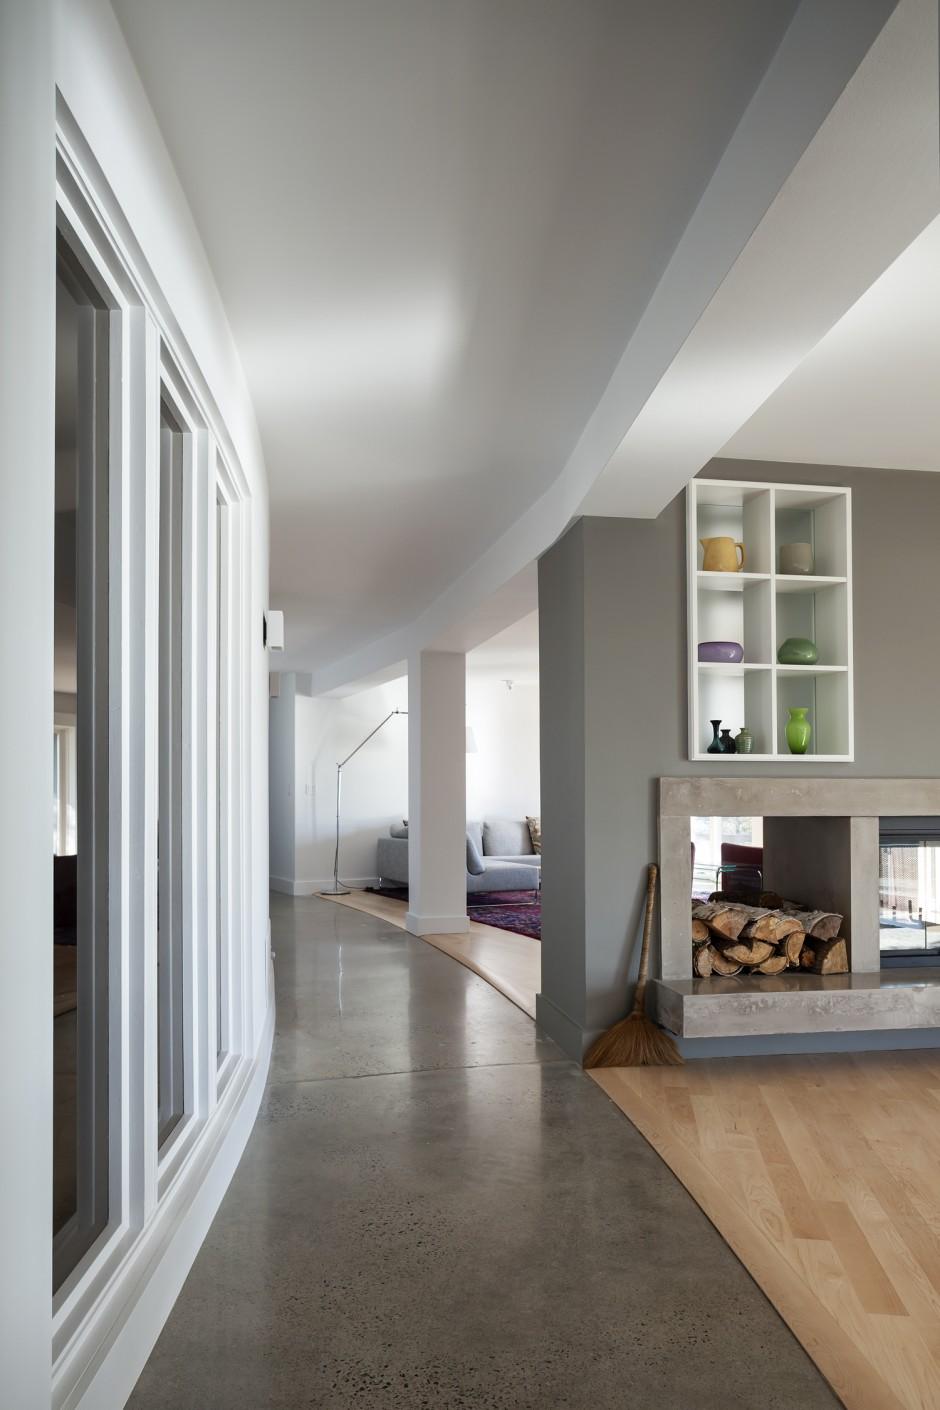 Ryder-house-Muskoka-by-Altius-Architects-04-940x1410.jpg